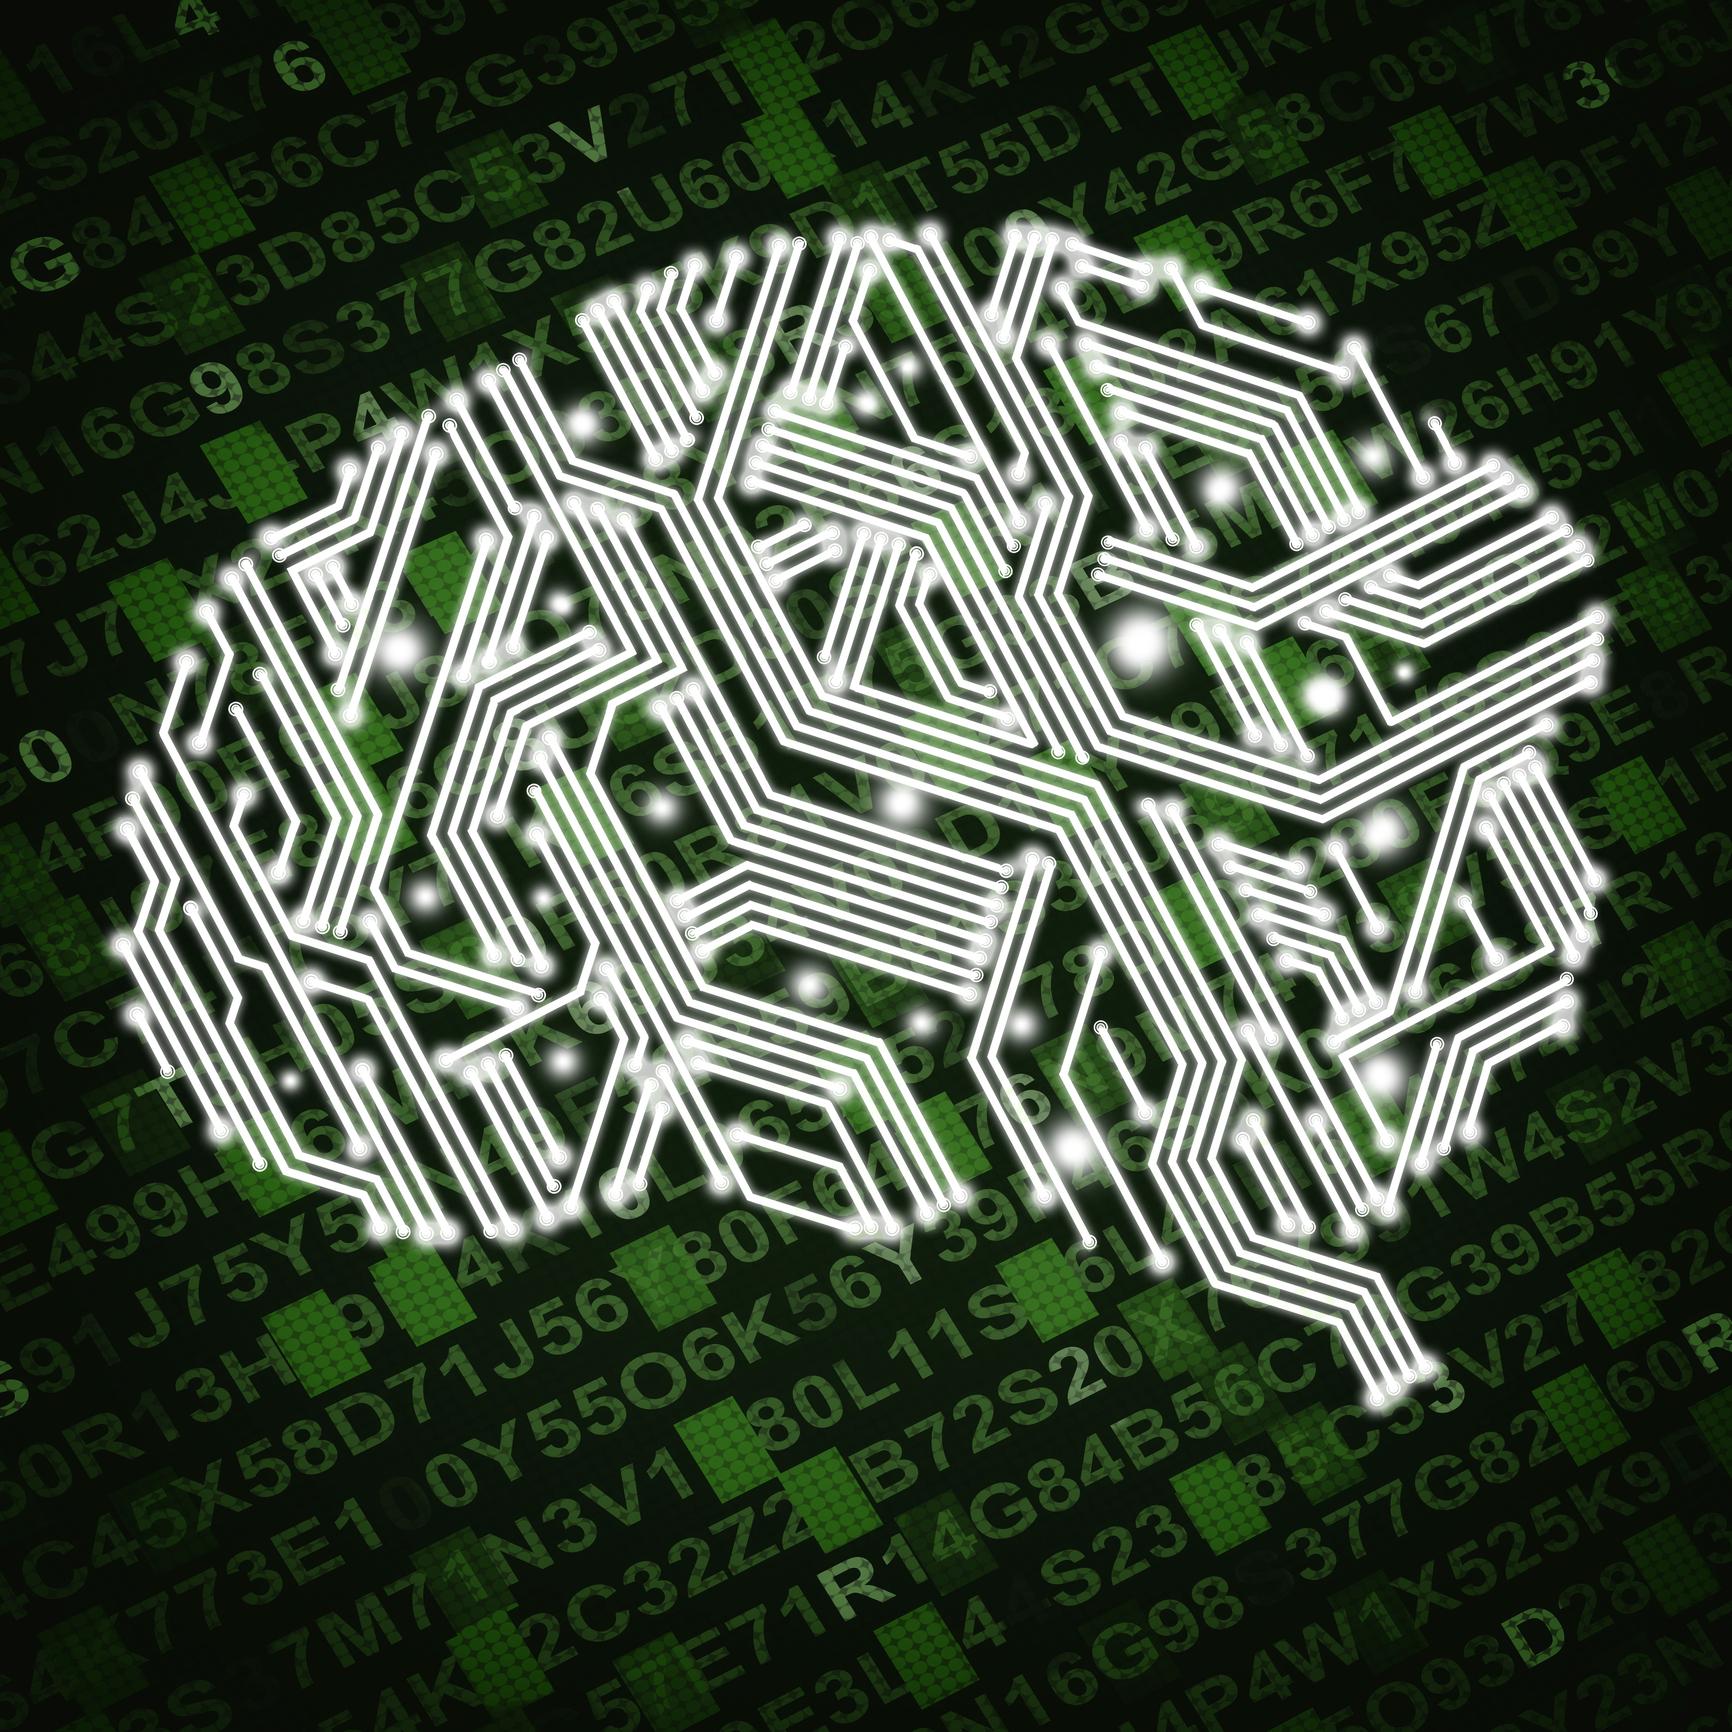 Illustration of circuit board in human brain form.